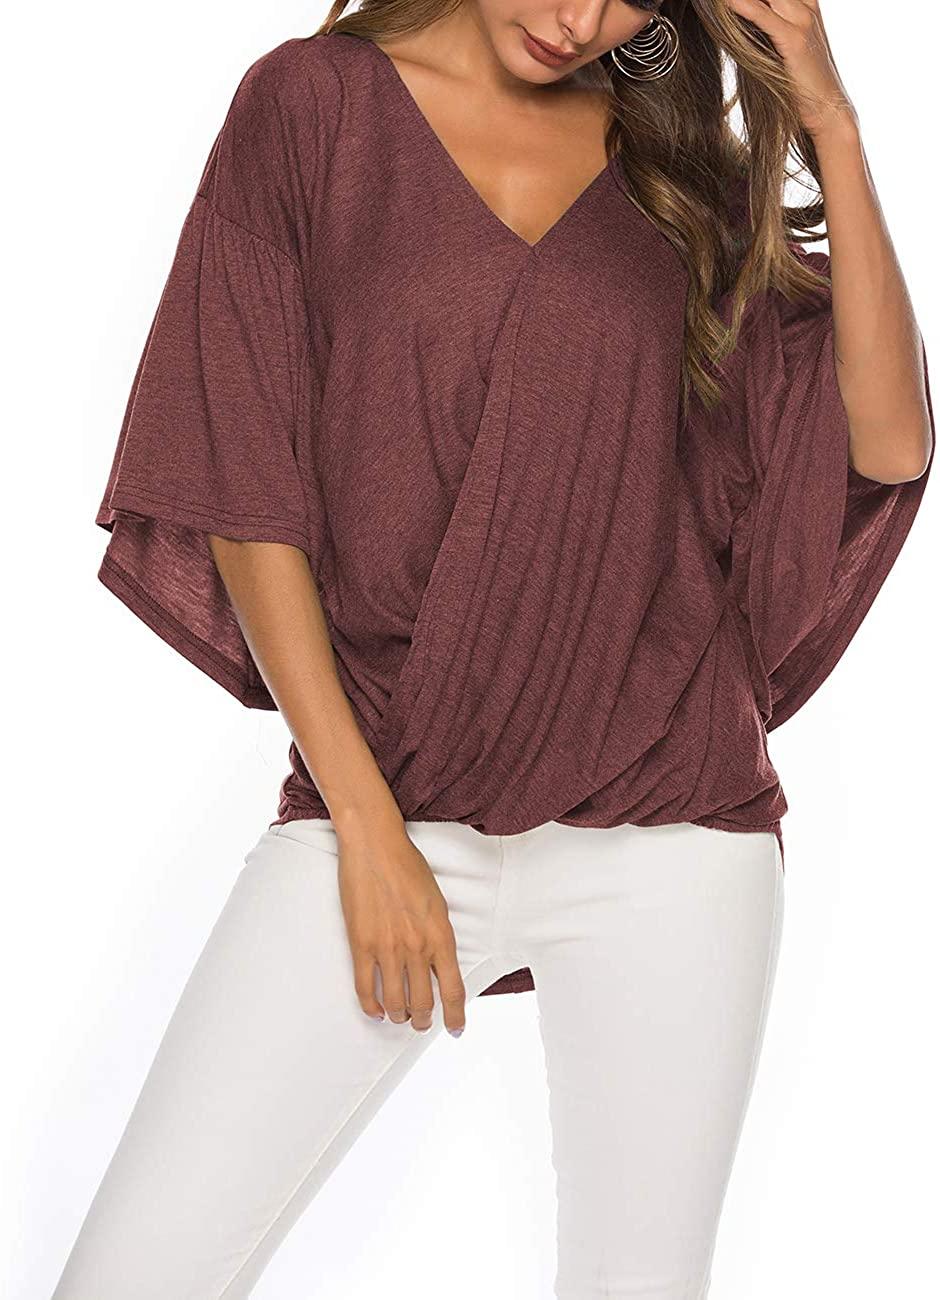 Rainlin Women Casual V Neck Tee Shirts Bell Sleeve High Low Hemline Blouses Tops